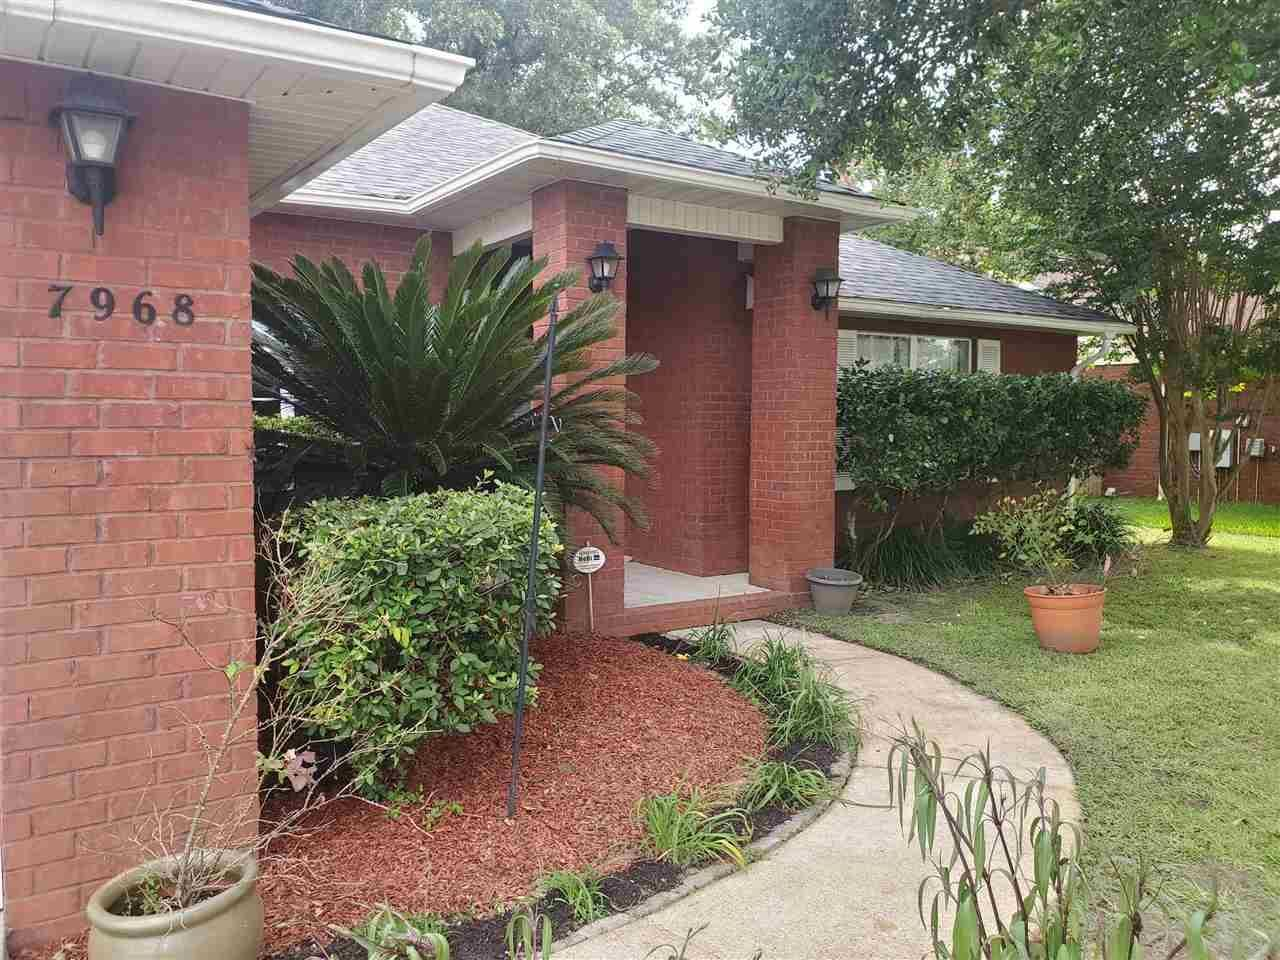 Property Image Of 7968 Lola Cir In Navarre, Fl